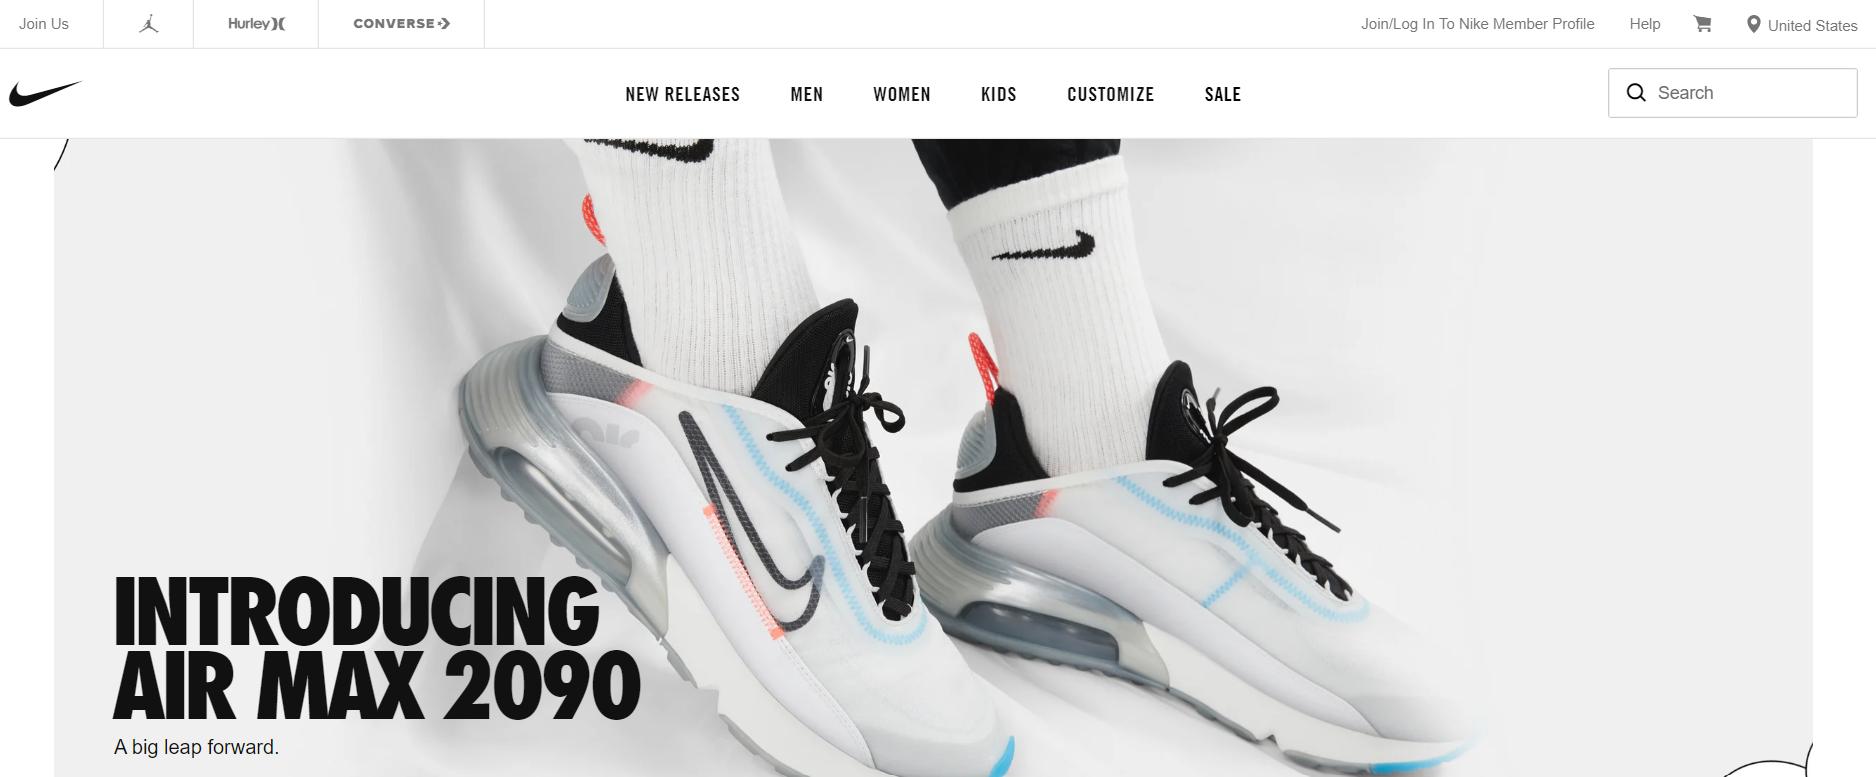 Nike's minimalistic web design